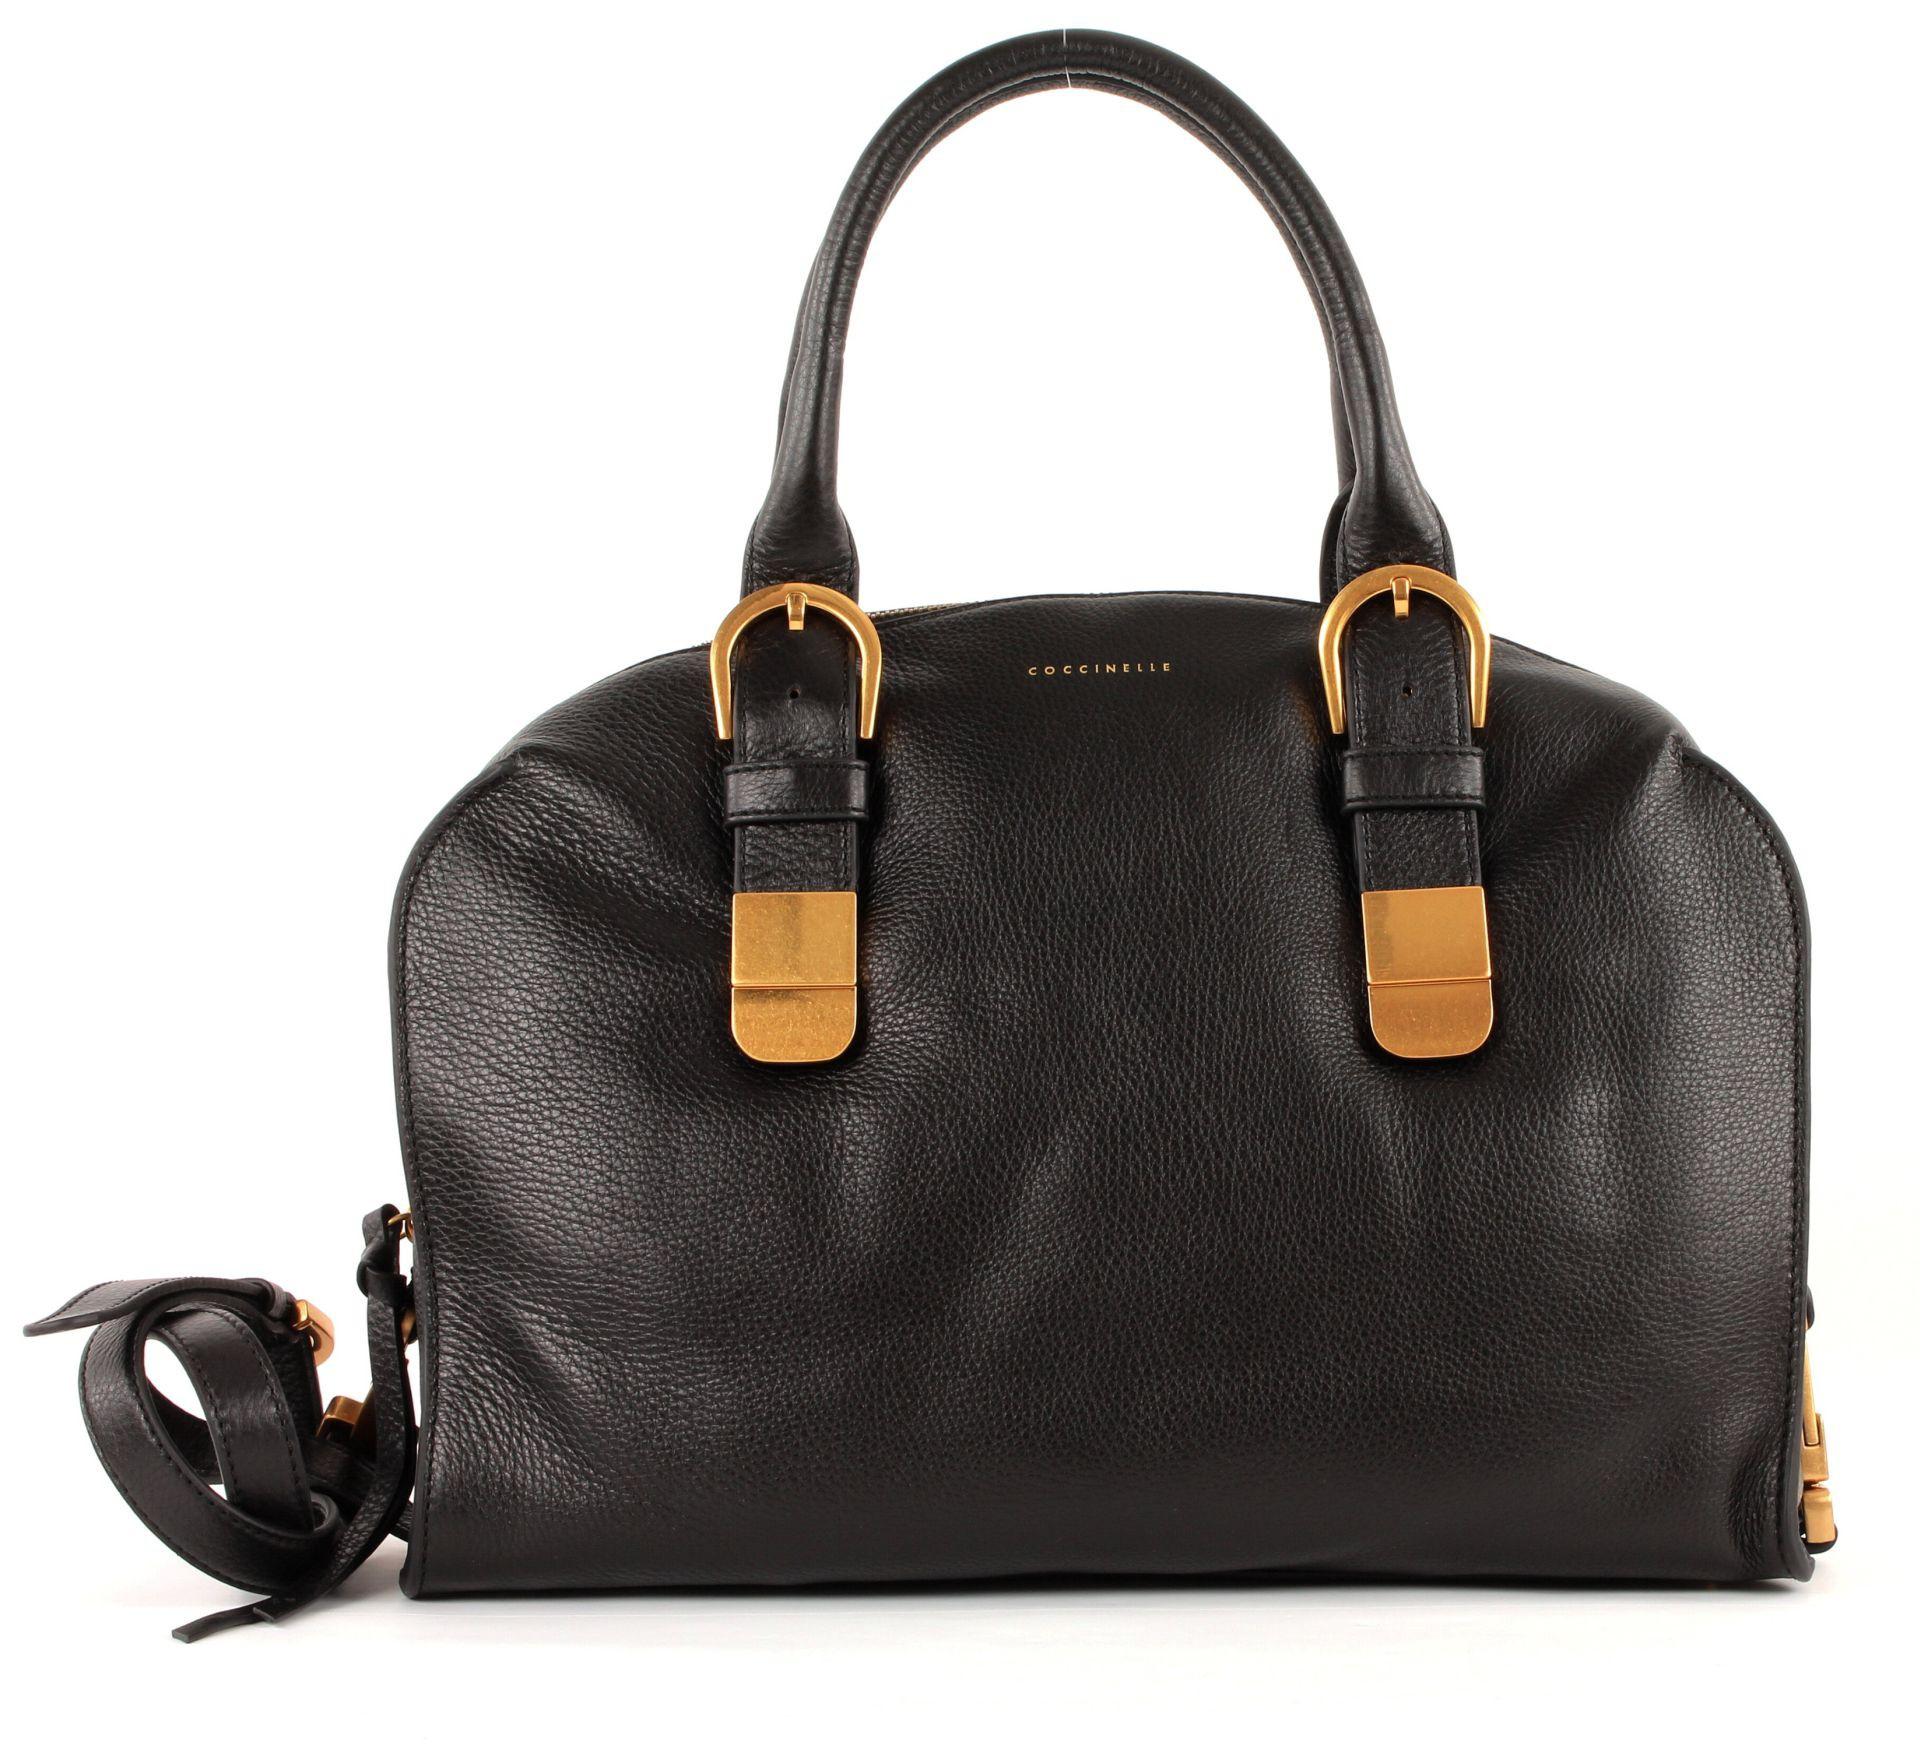 coccinelle roma handbag tasche handtasche umh ngetasche damen schwarz nero leder ebay. Black Bedroom Furniture Sets. Home Design Ideas